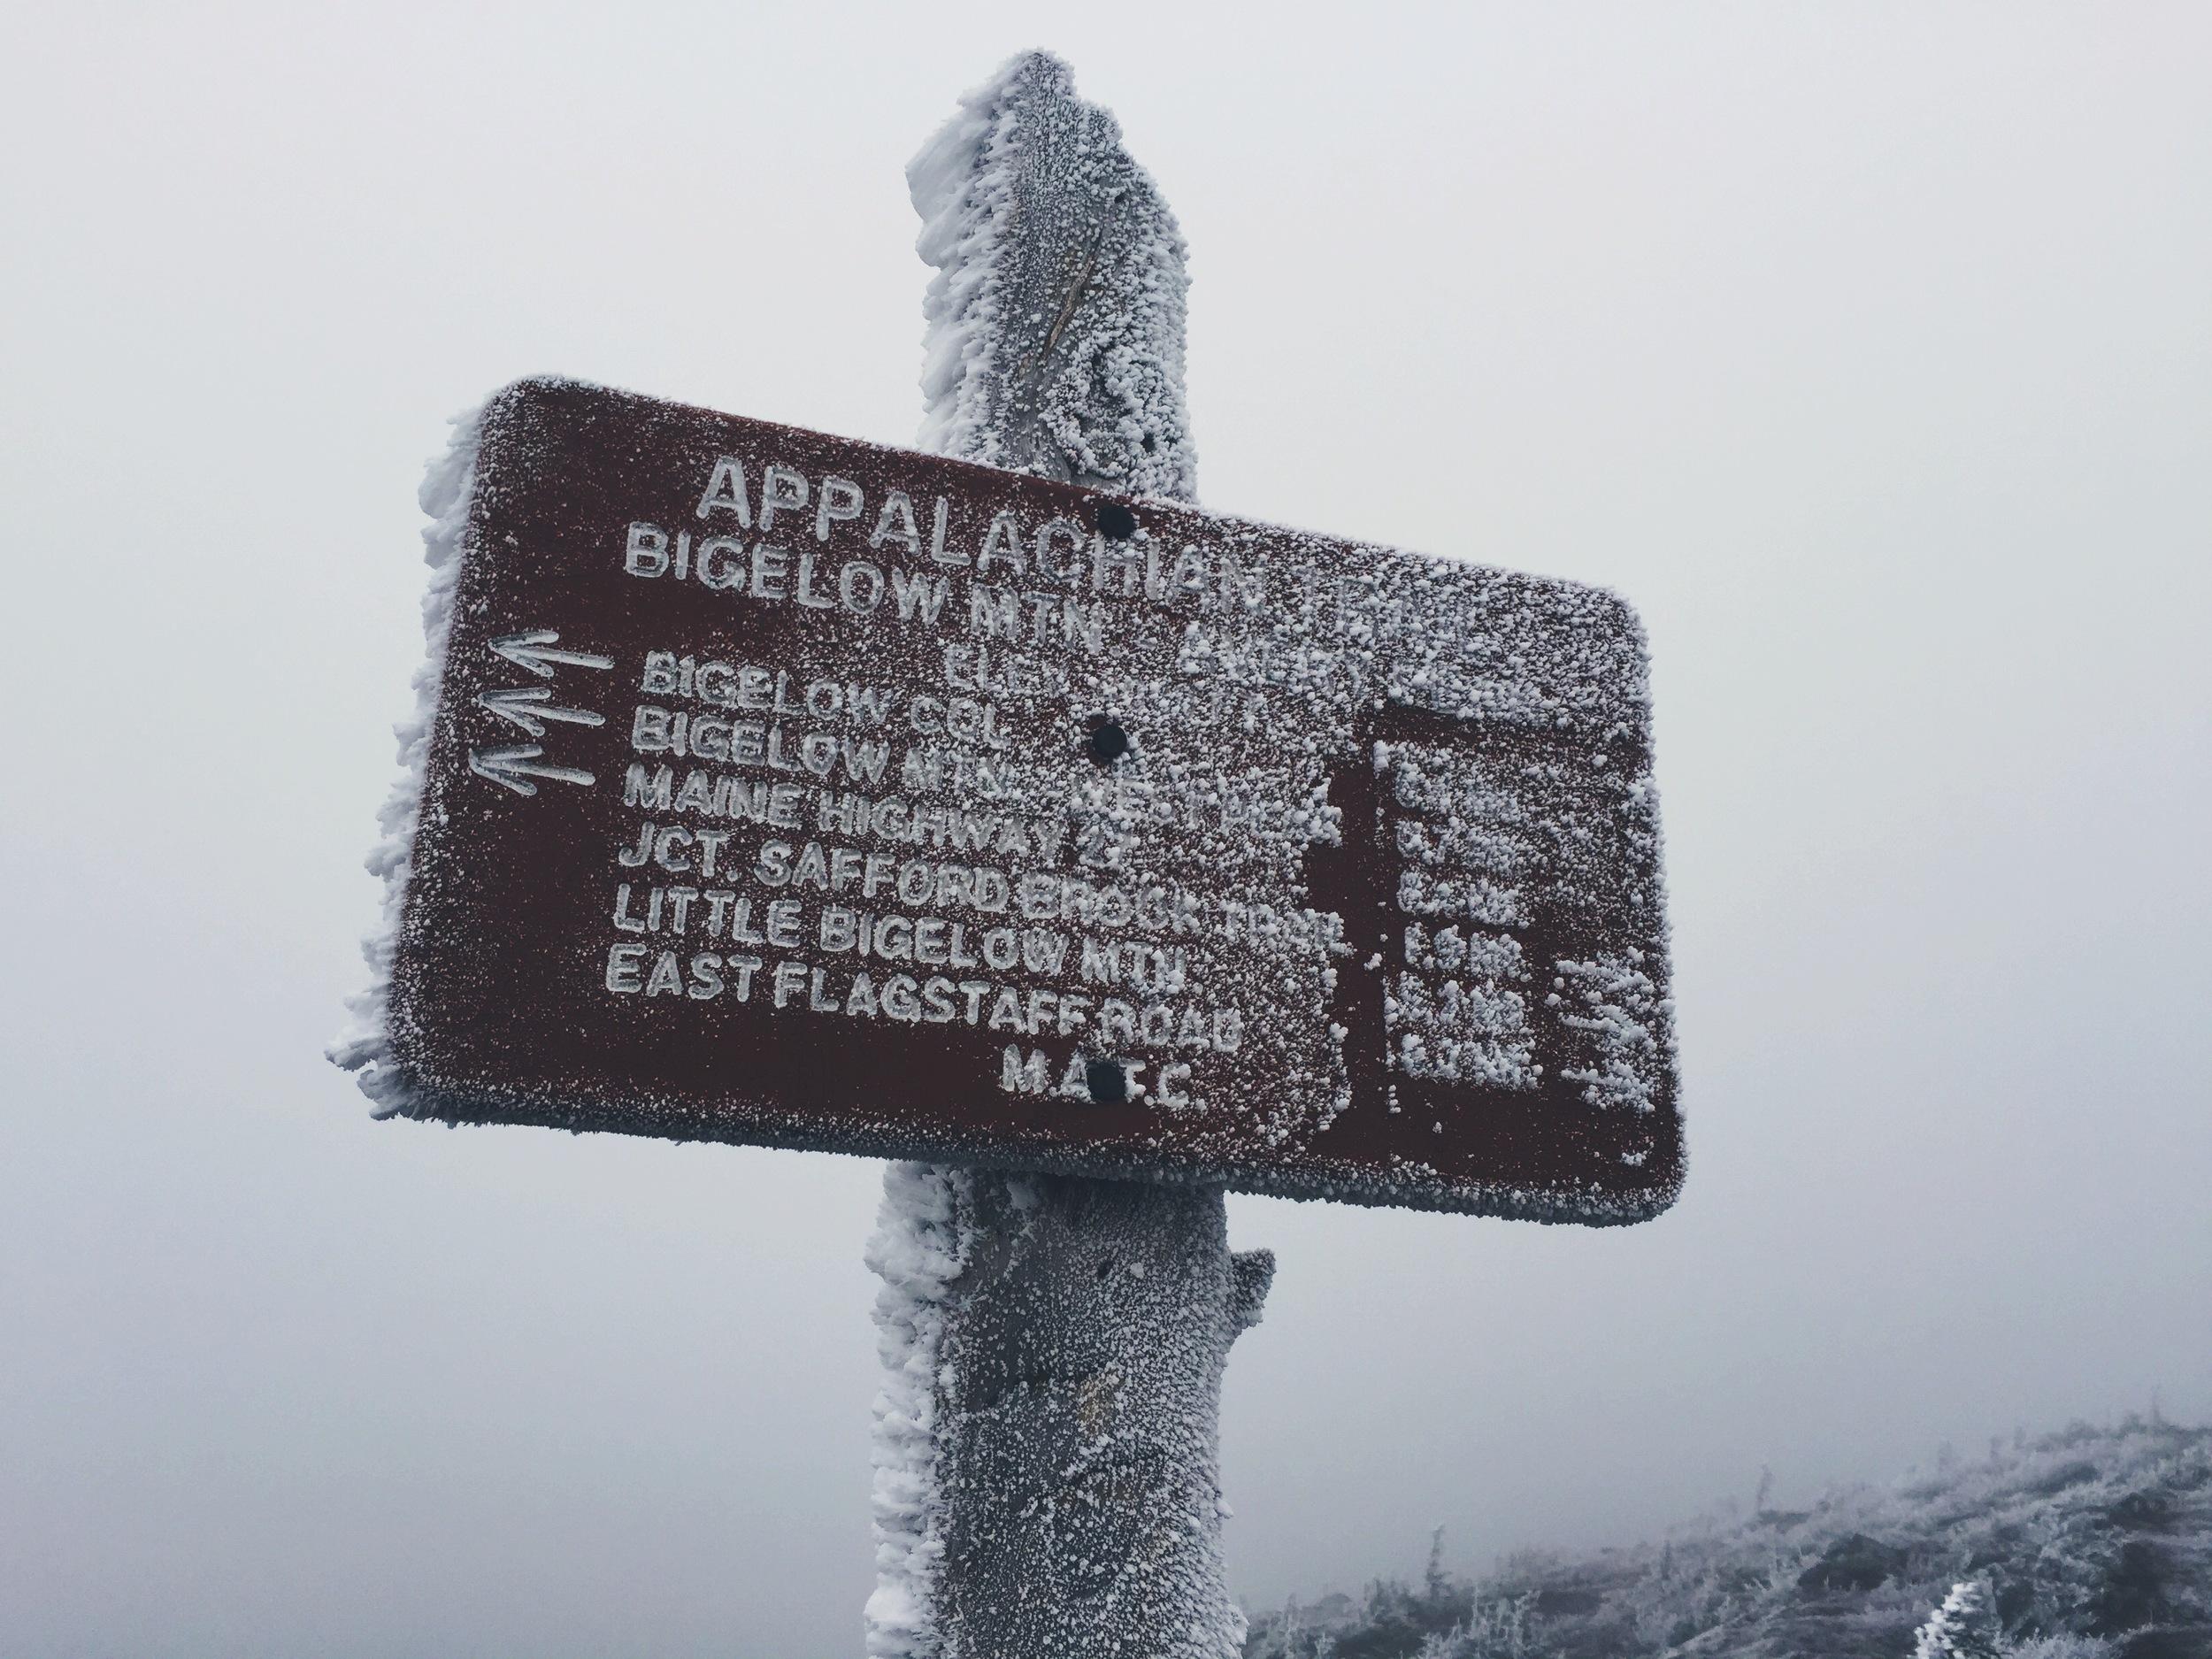 The ice-blasted summit of Avery Peak (#8 on map elevation profile).